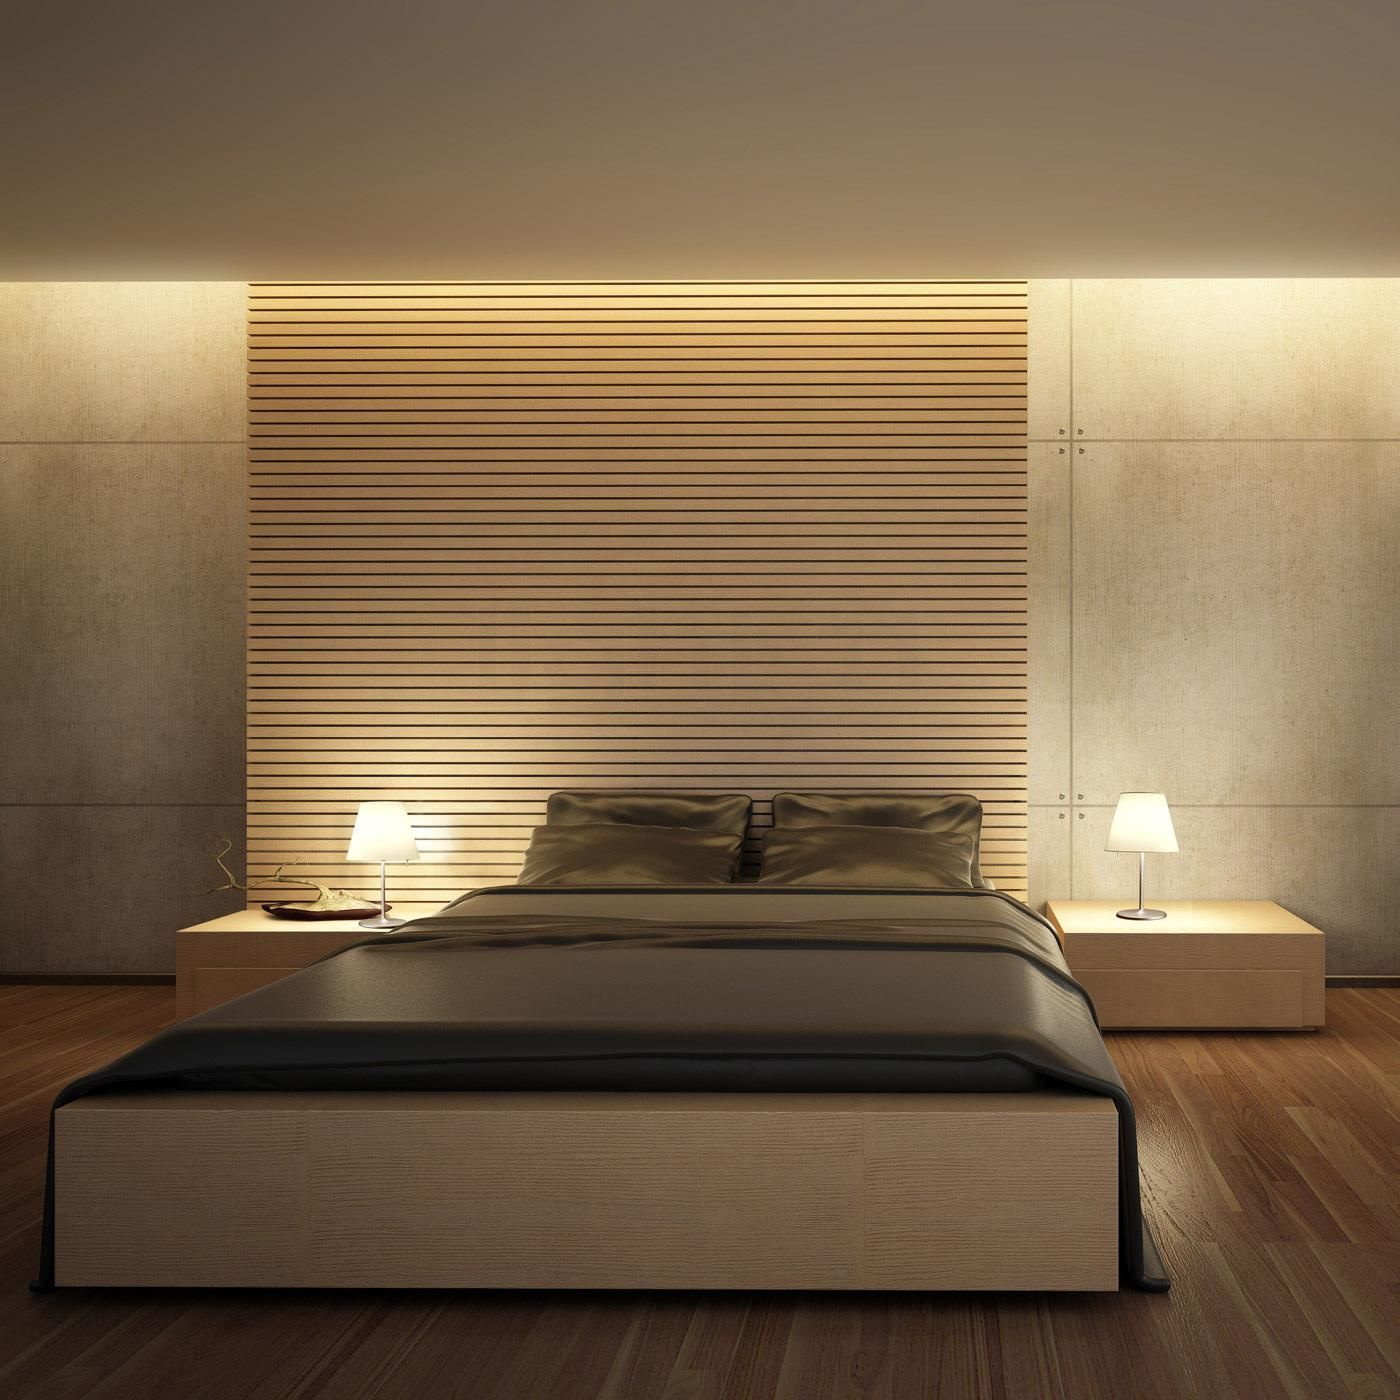 Artemide Melampo Notte Luxus Interieur Luxusschlafzimmer